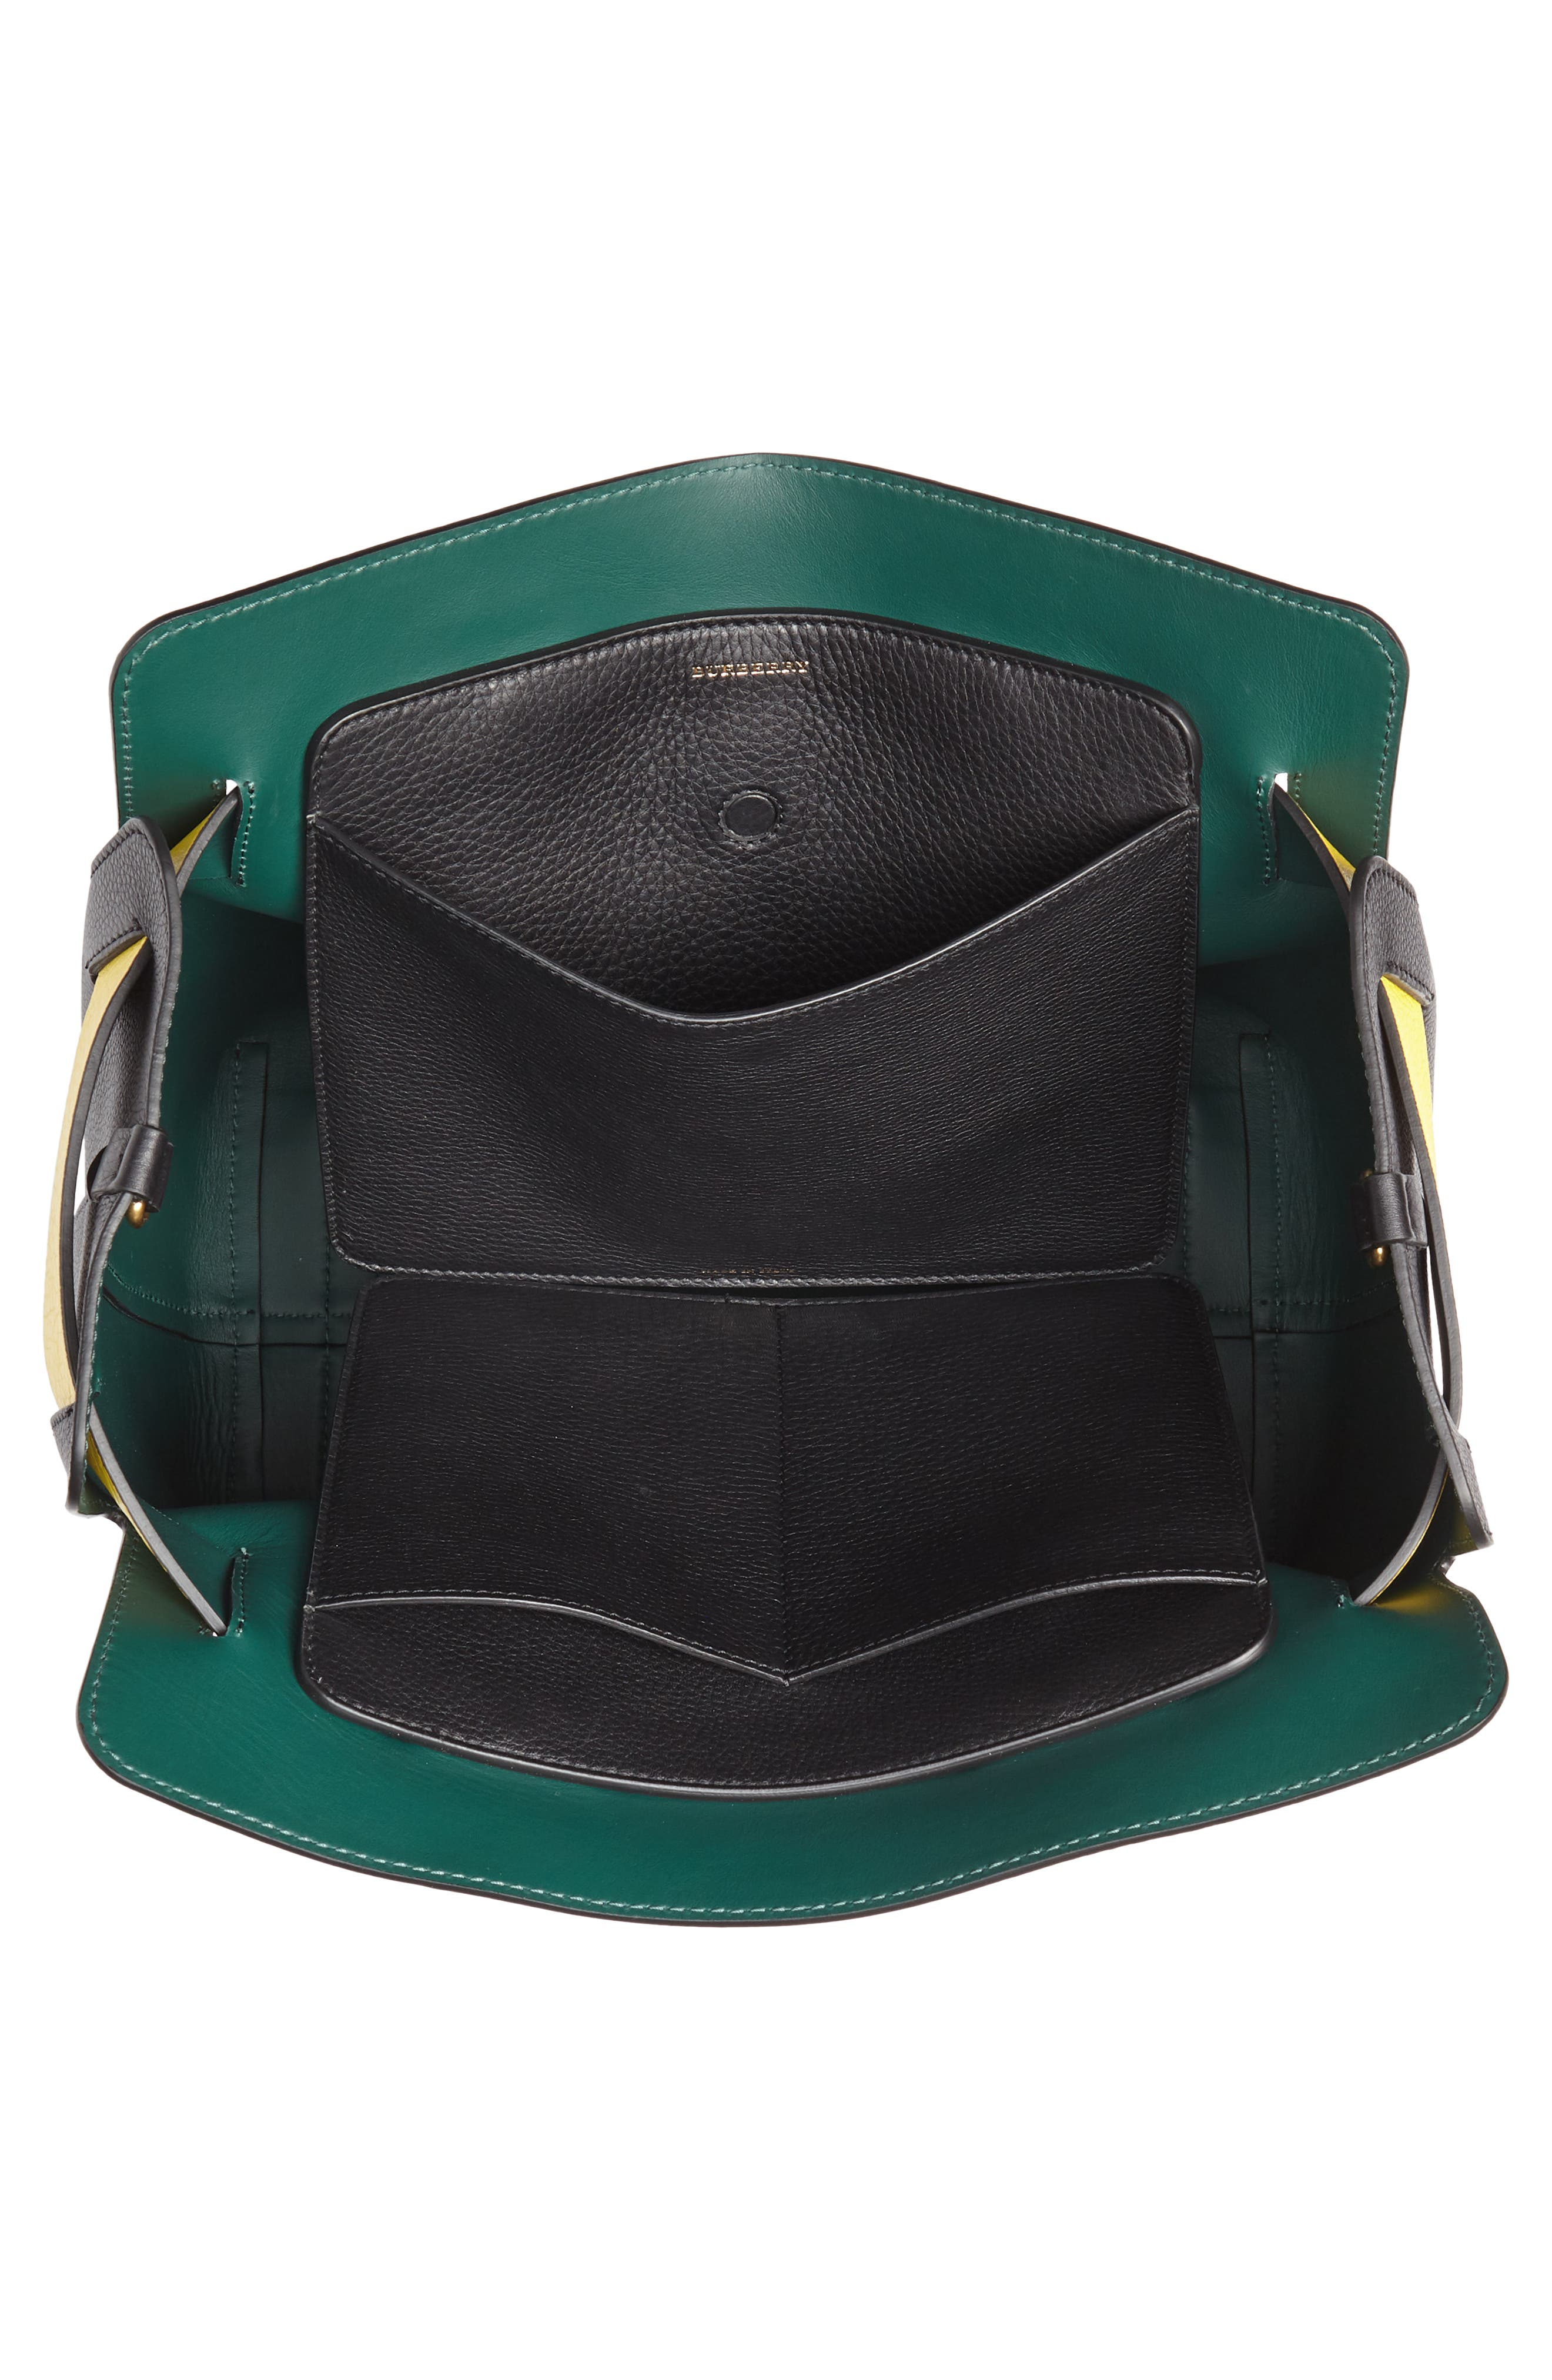 Medium Belt Bag Leather Tote,                             Alternate thumbnail 5, color,                             001